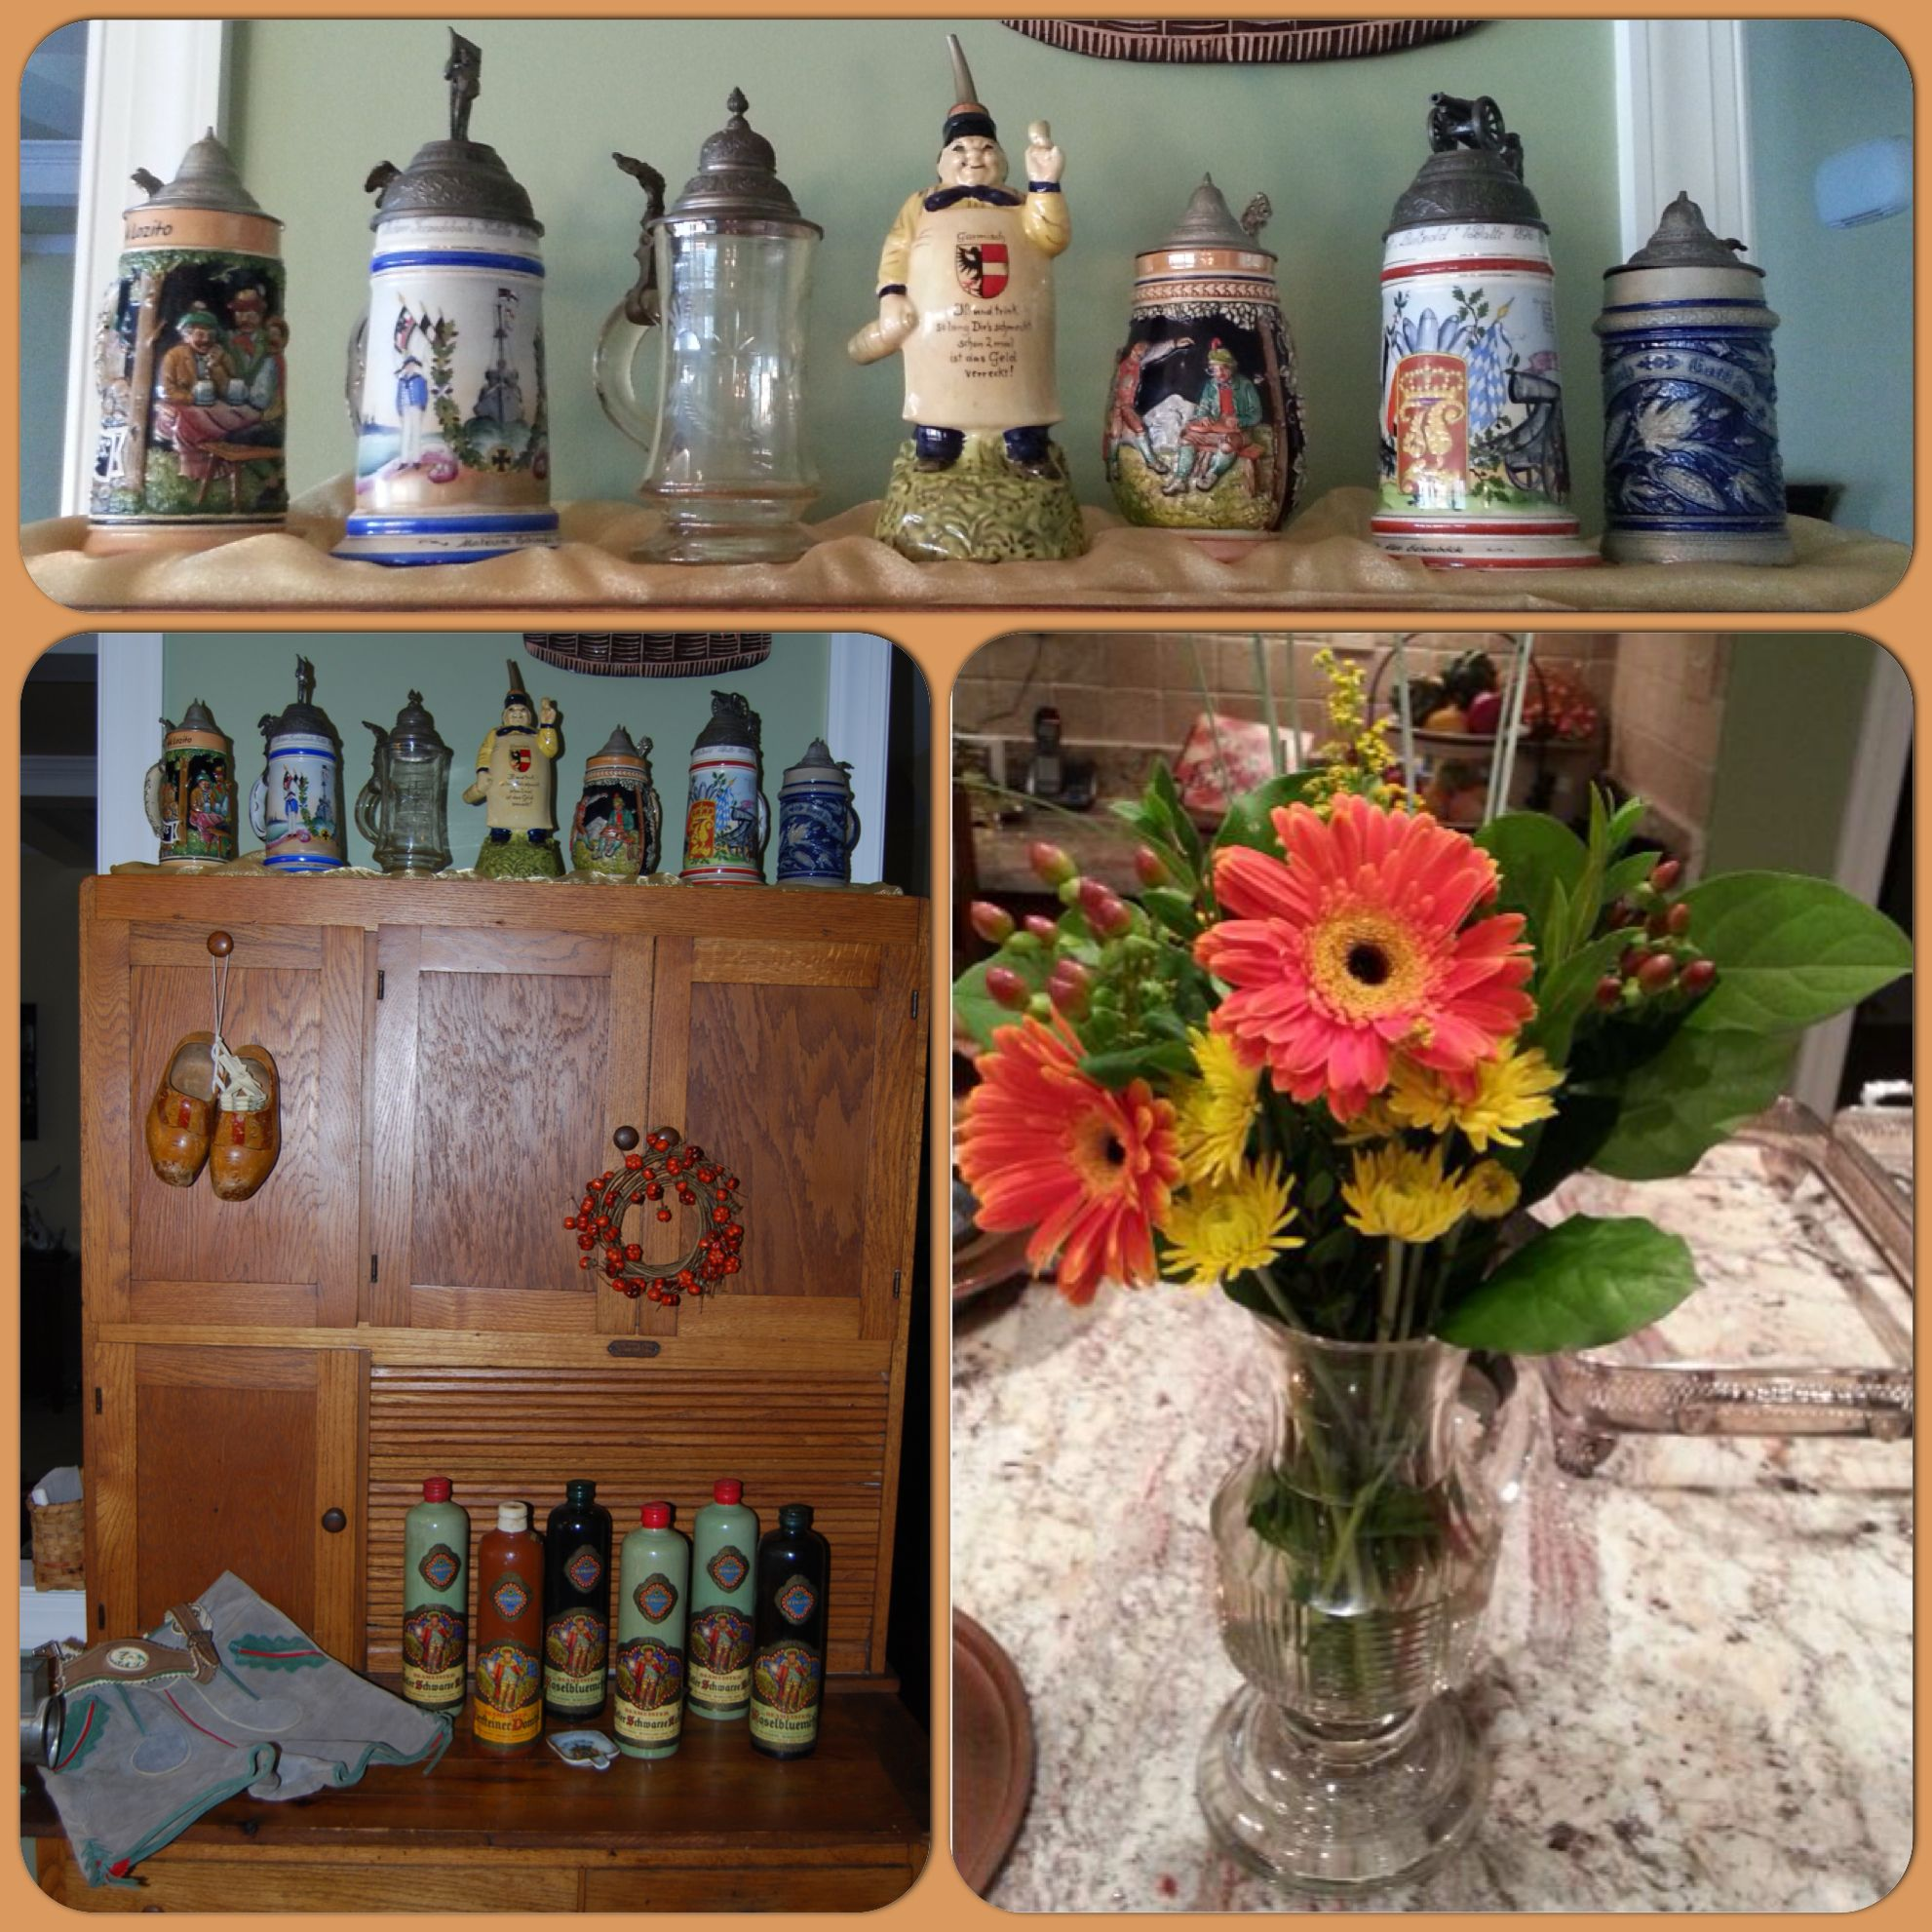 Vintage Italian Kitchen Decor: I Used Antique German Steins, Beameister Wine Bottles, A